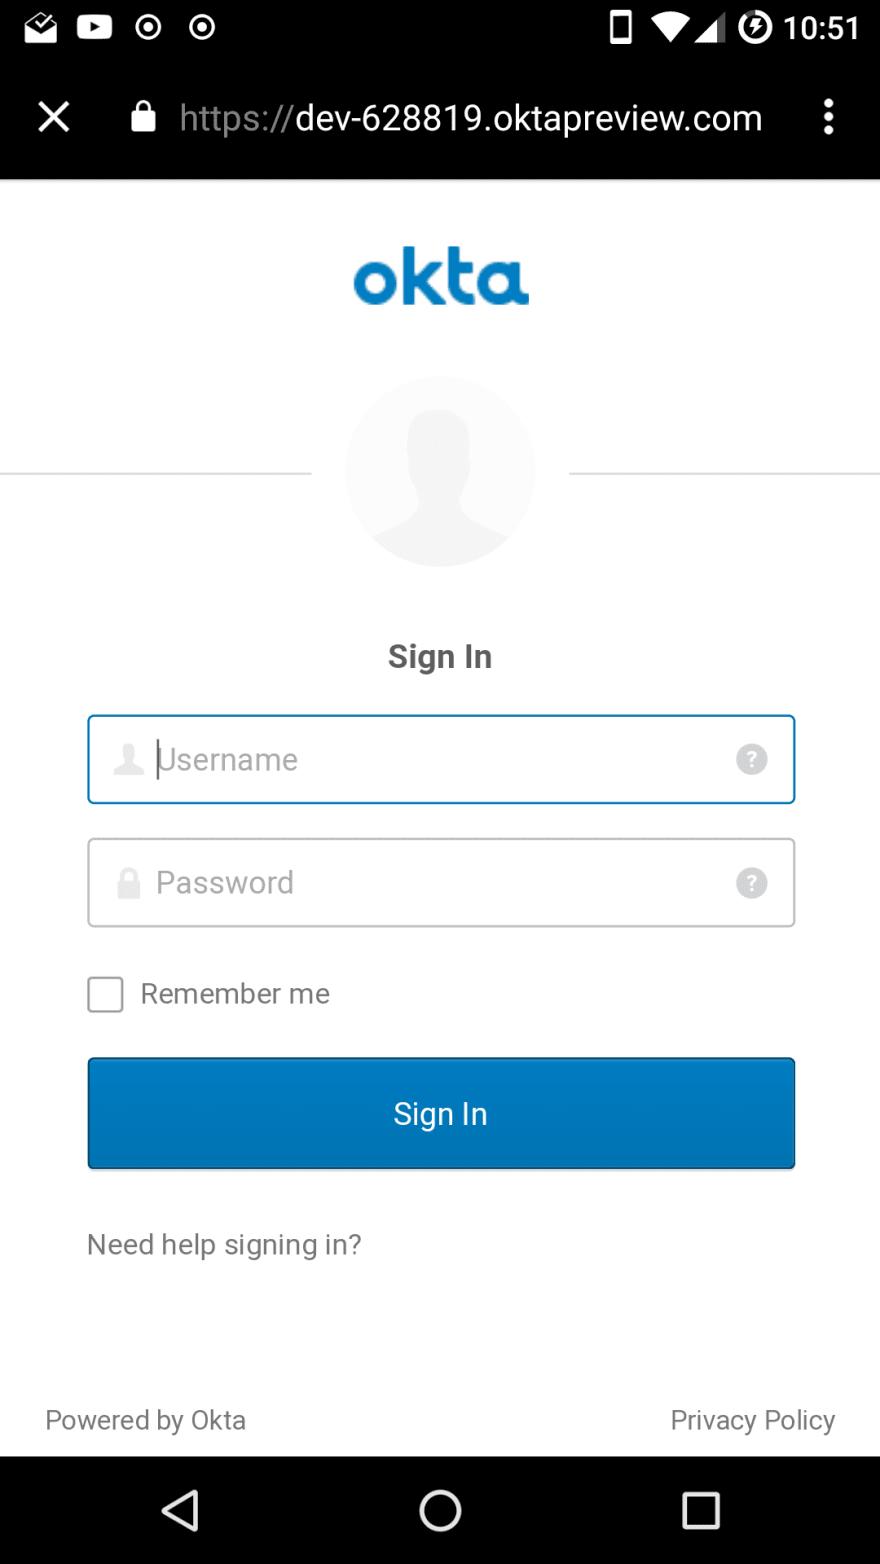 Okta login screen